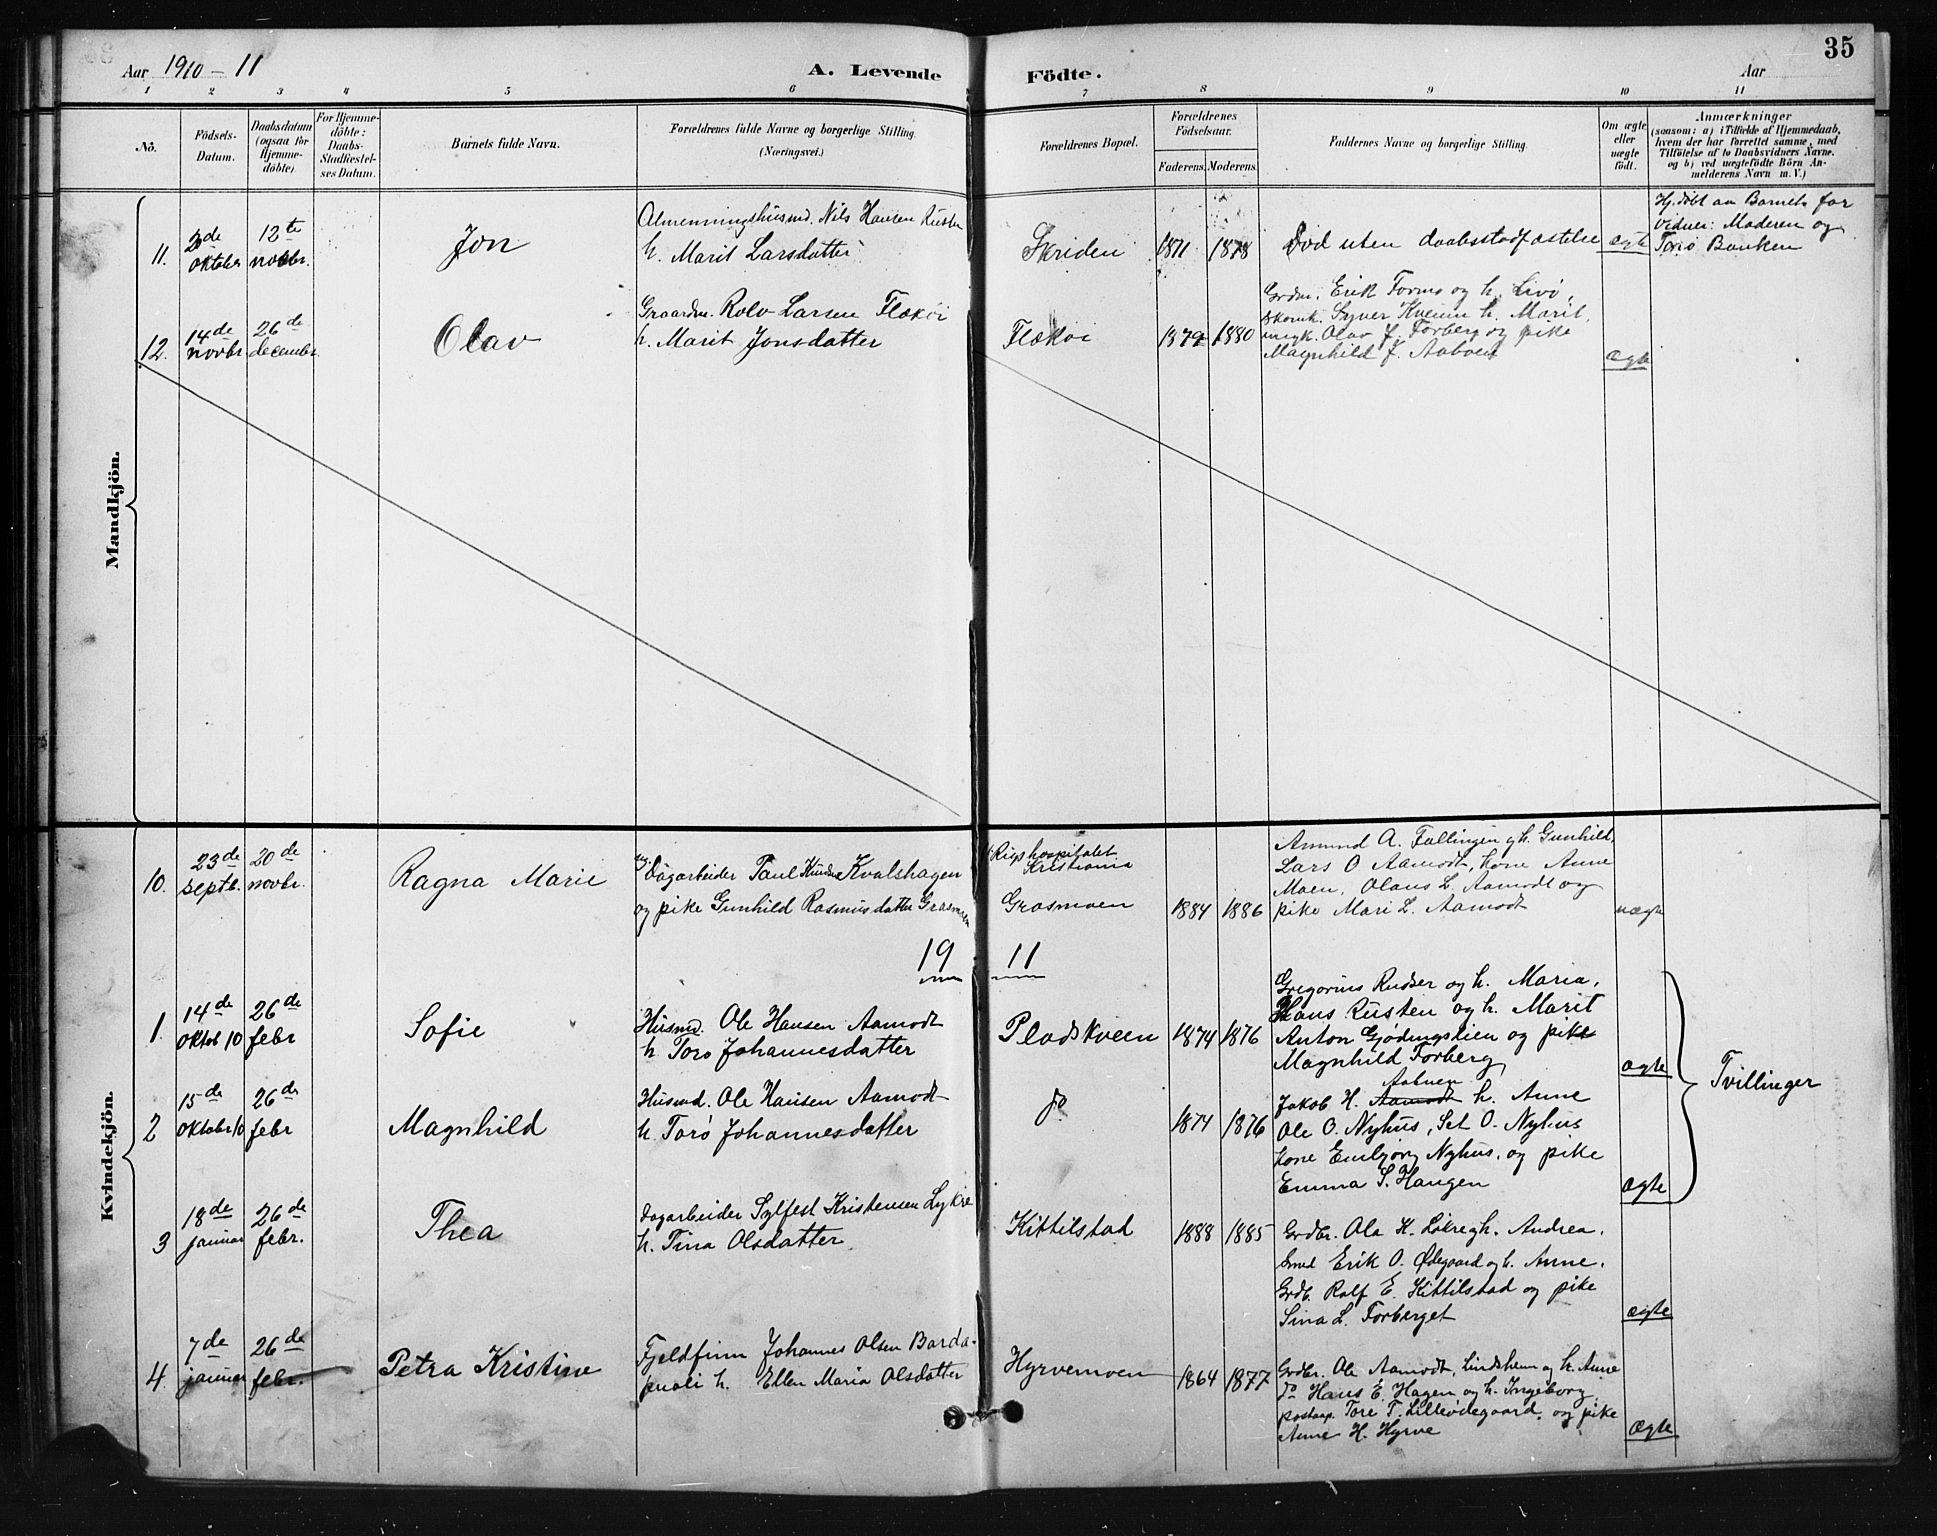 SAH, Skjåk prestekontor, Klokkerbok nr. 4, 1895-1921, s. 35